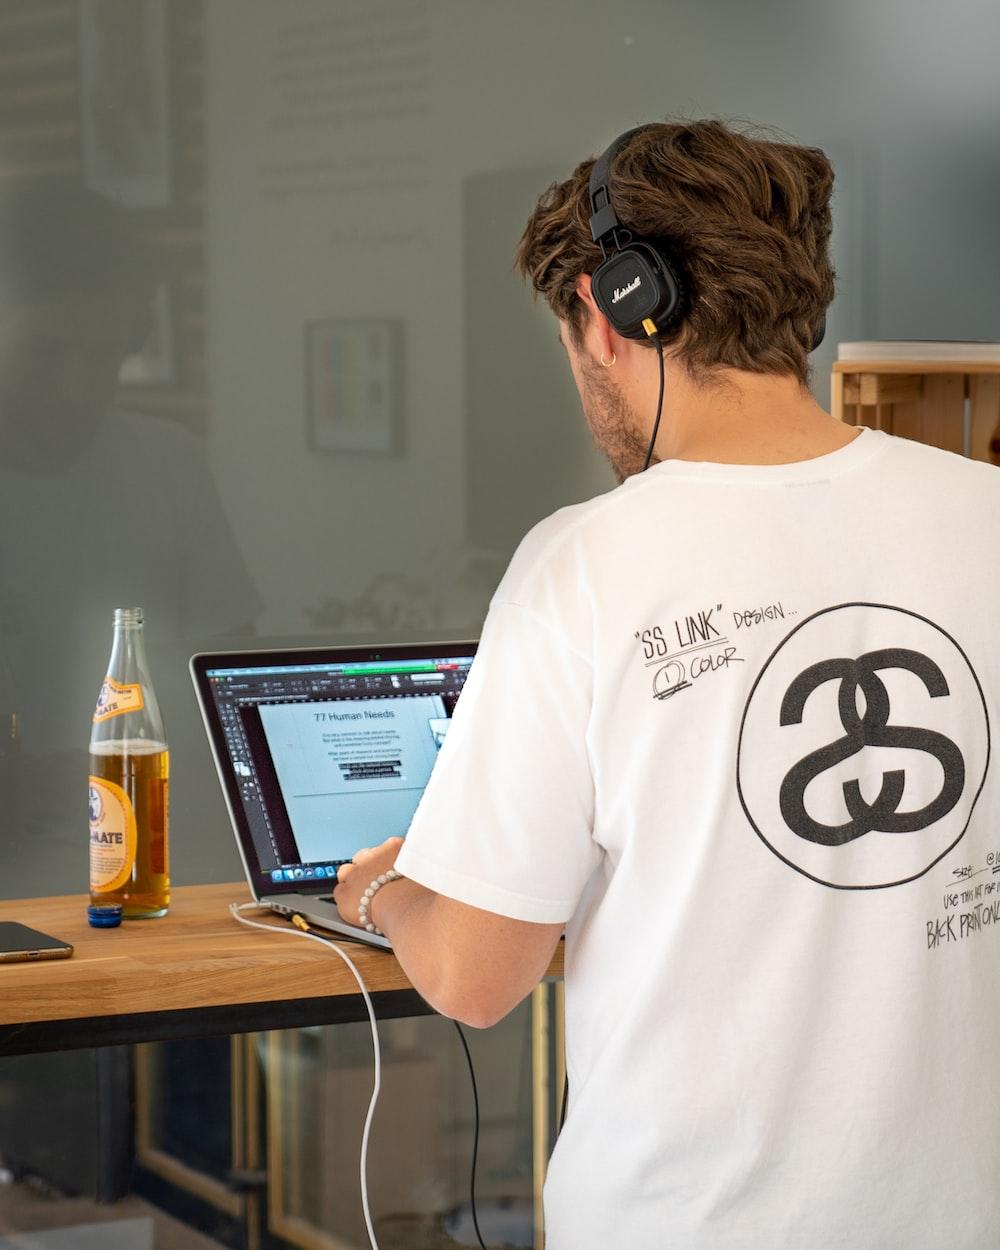 man in white crew neck t-shirt wearing black headphones